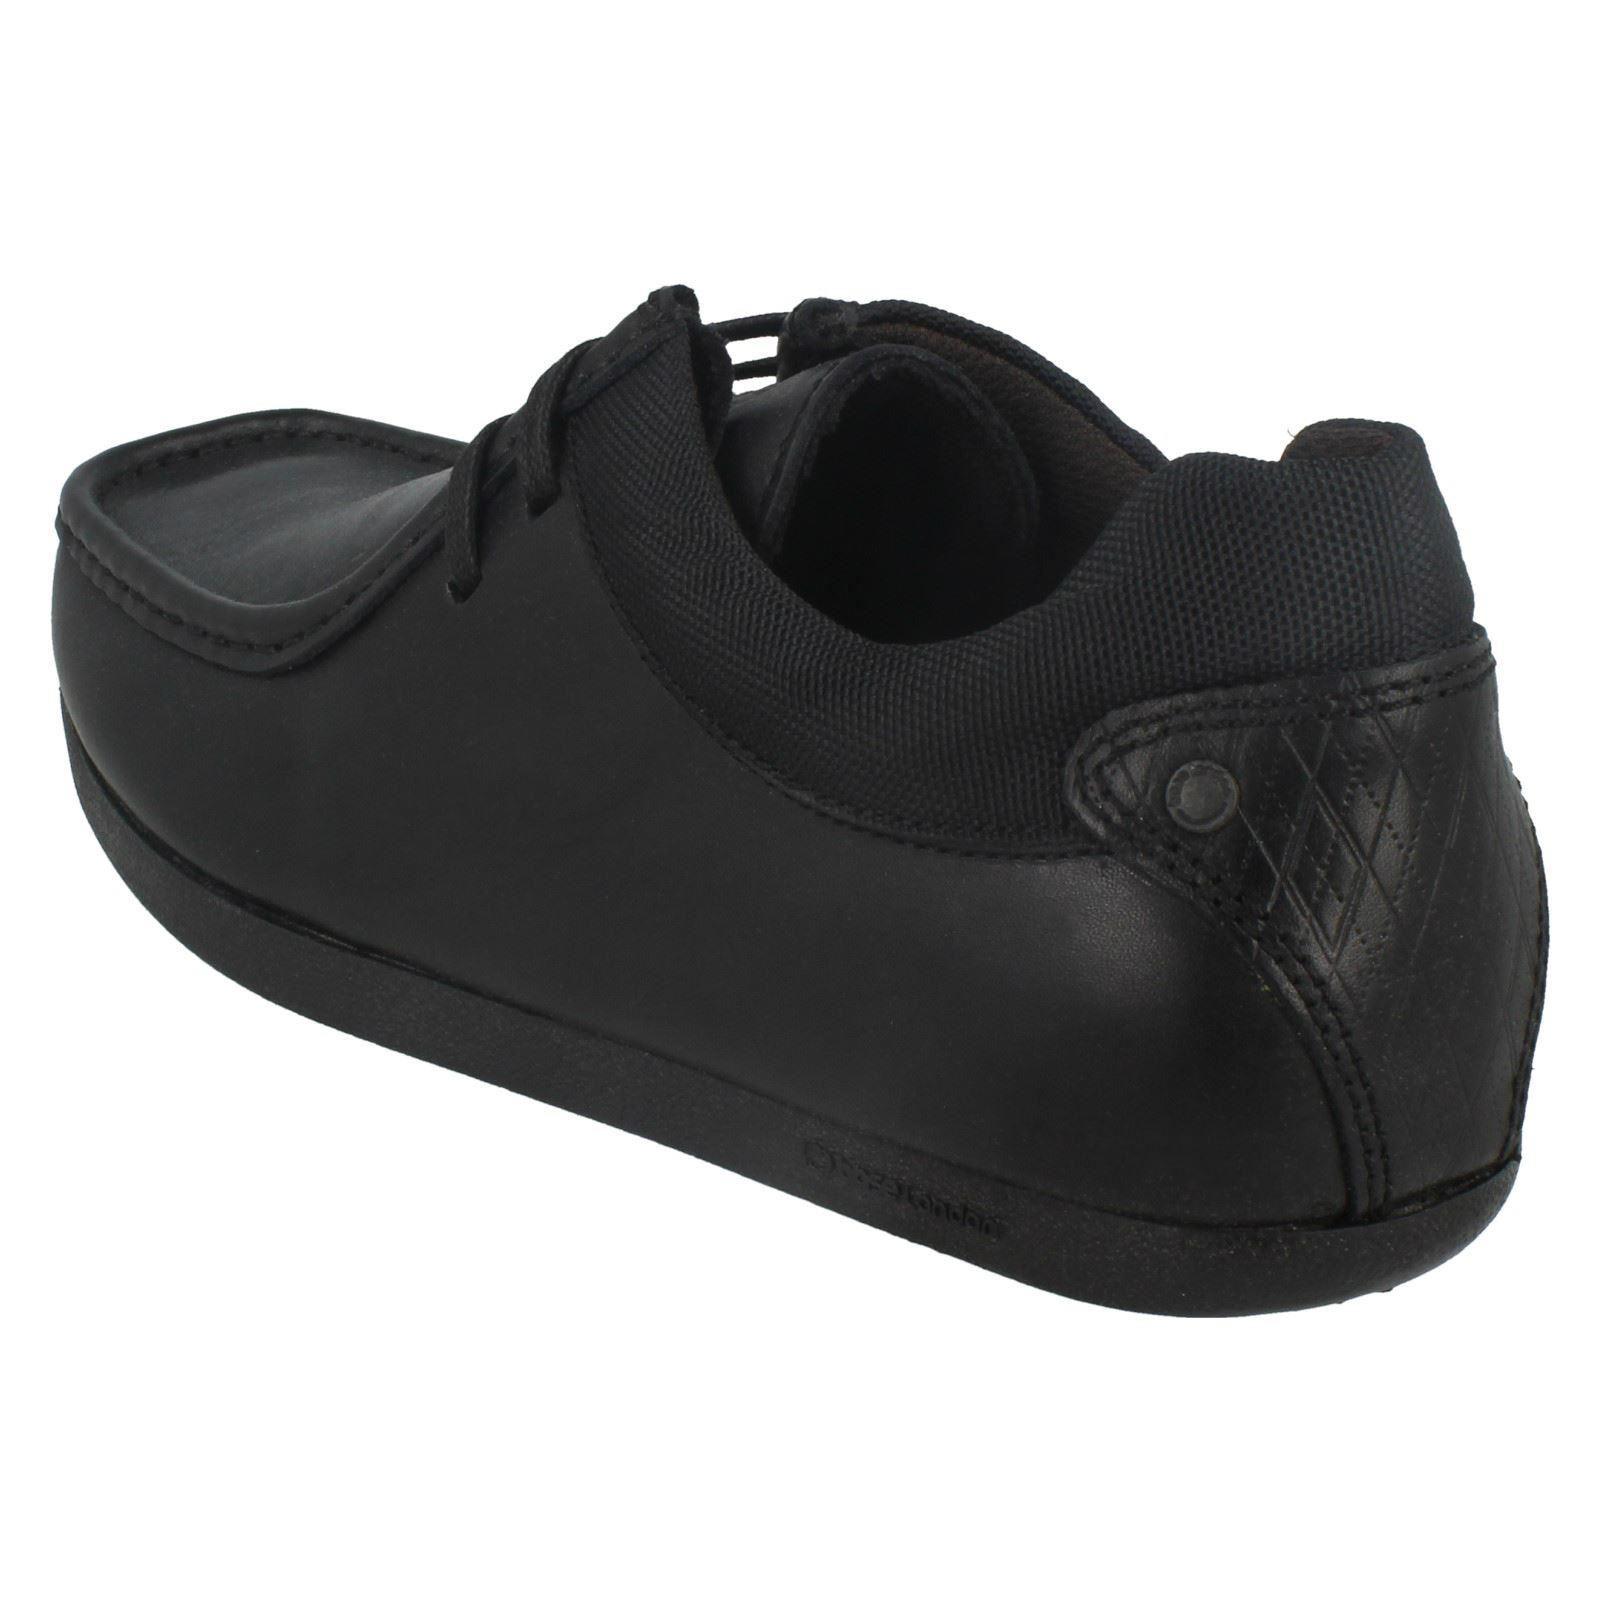 Noir London ᄄᄂ Lacets Base Hommes Chaussures Formal Edition tshrQd